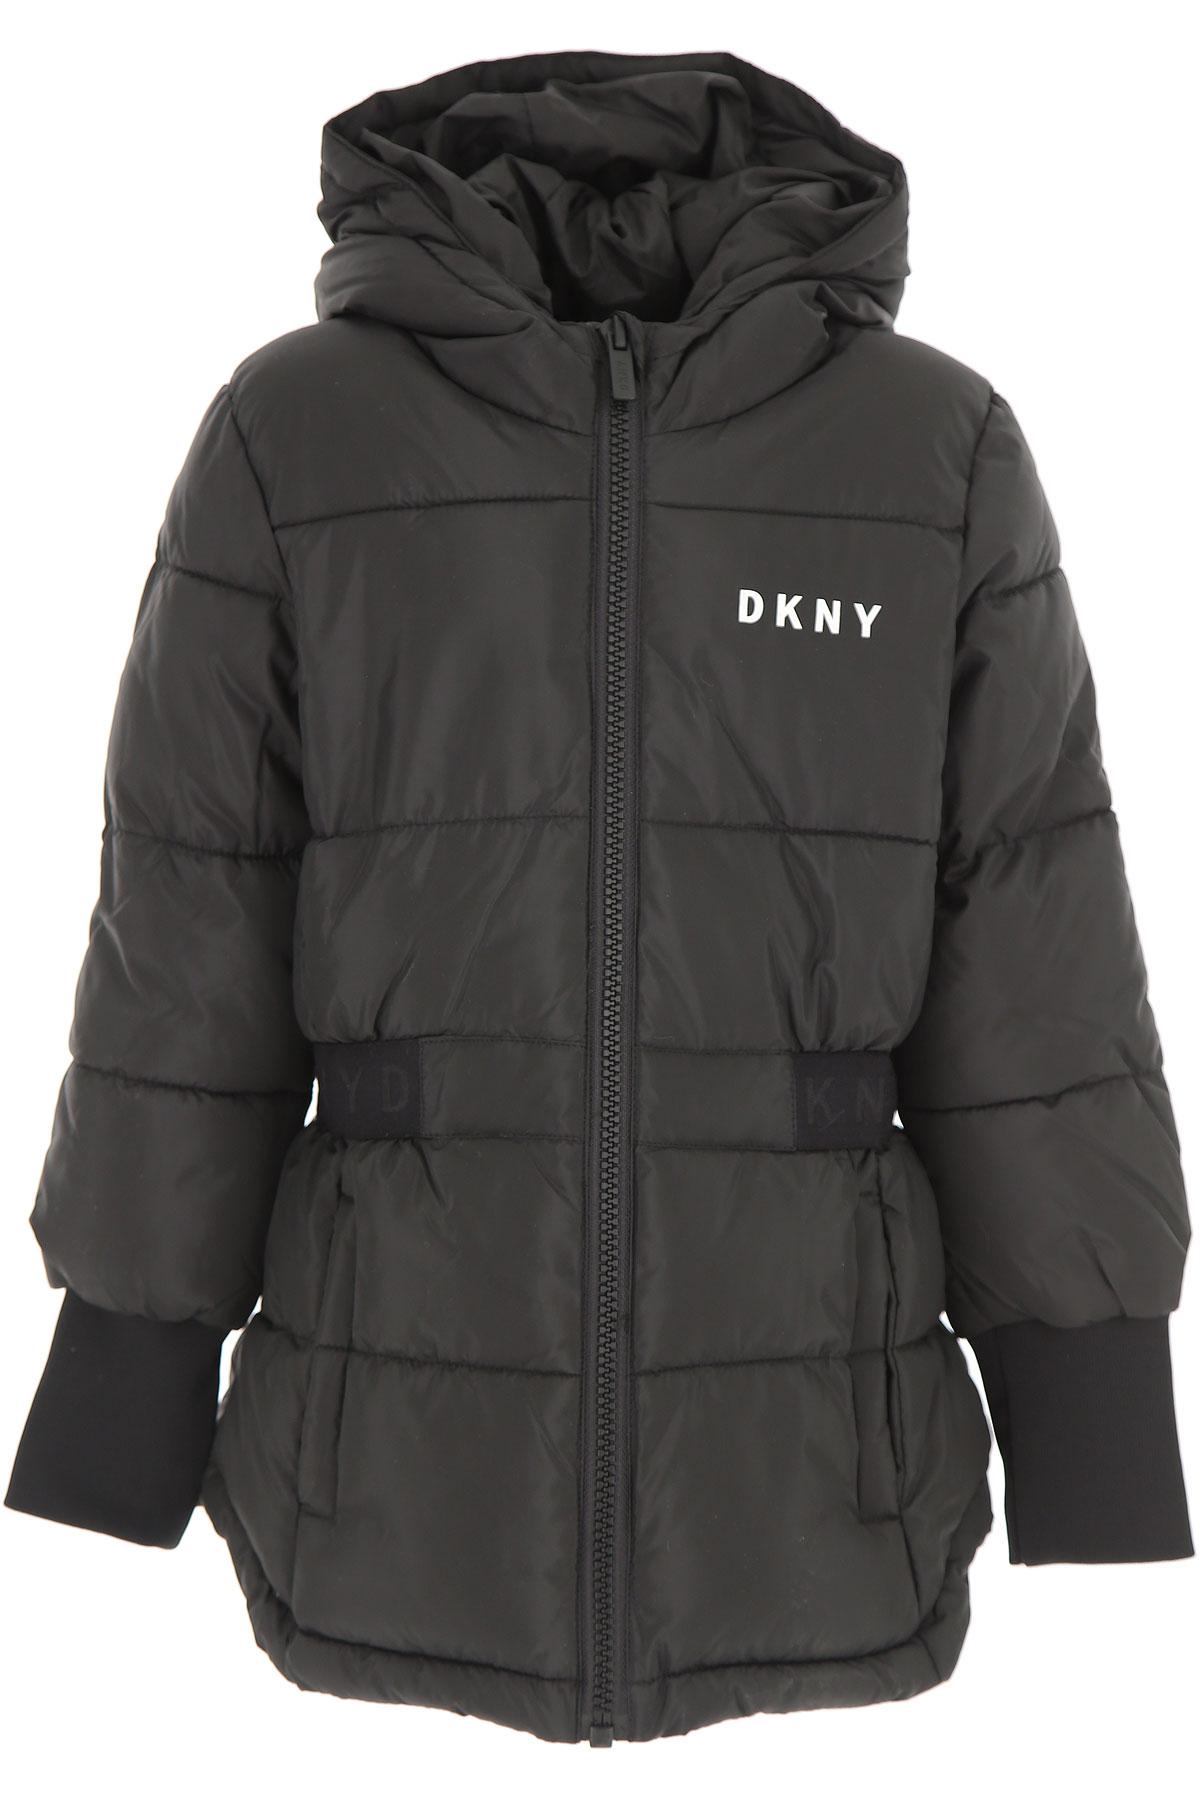 Image of DKNY Girls Down Jacket for Kids, Puffer Ski Jacket, Black, polyester, 2017, 10Y 14Y 16Y 8Y